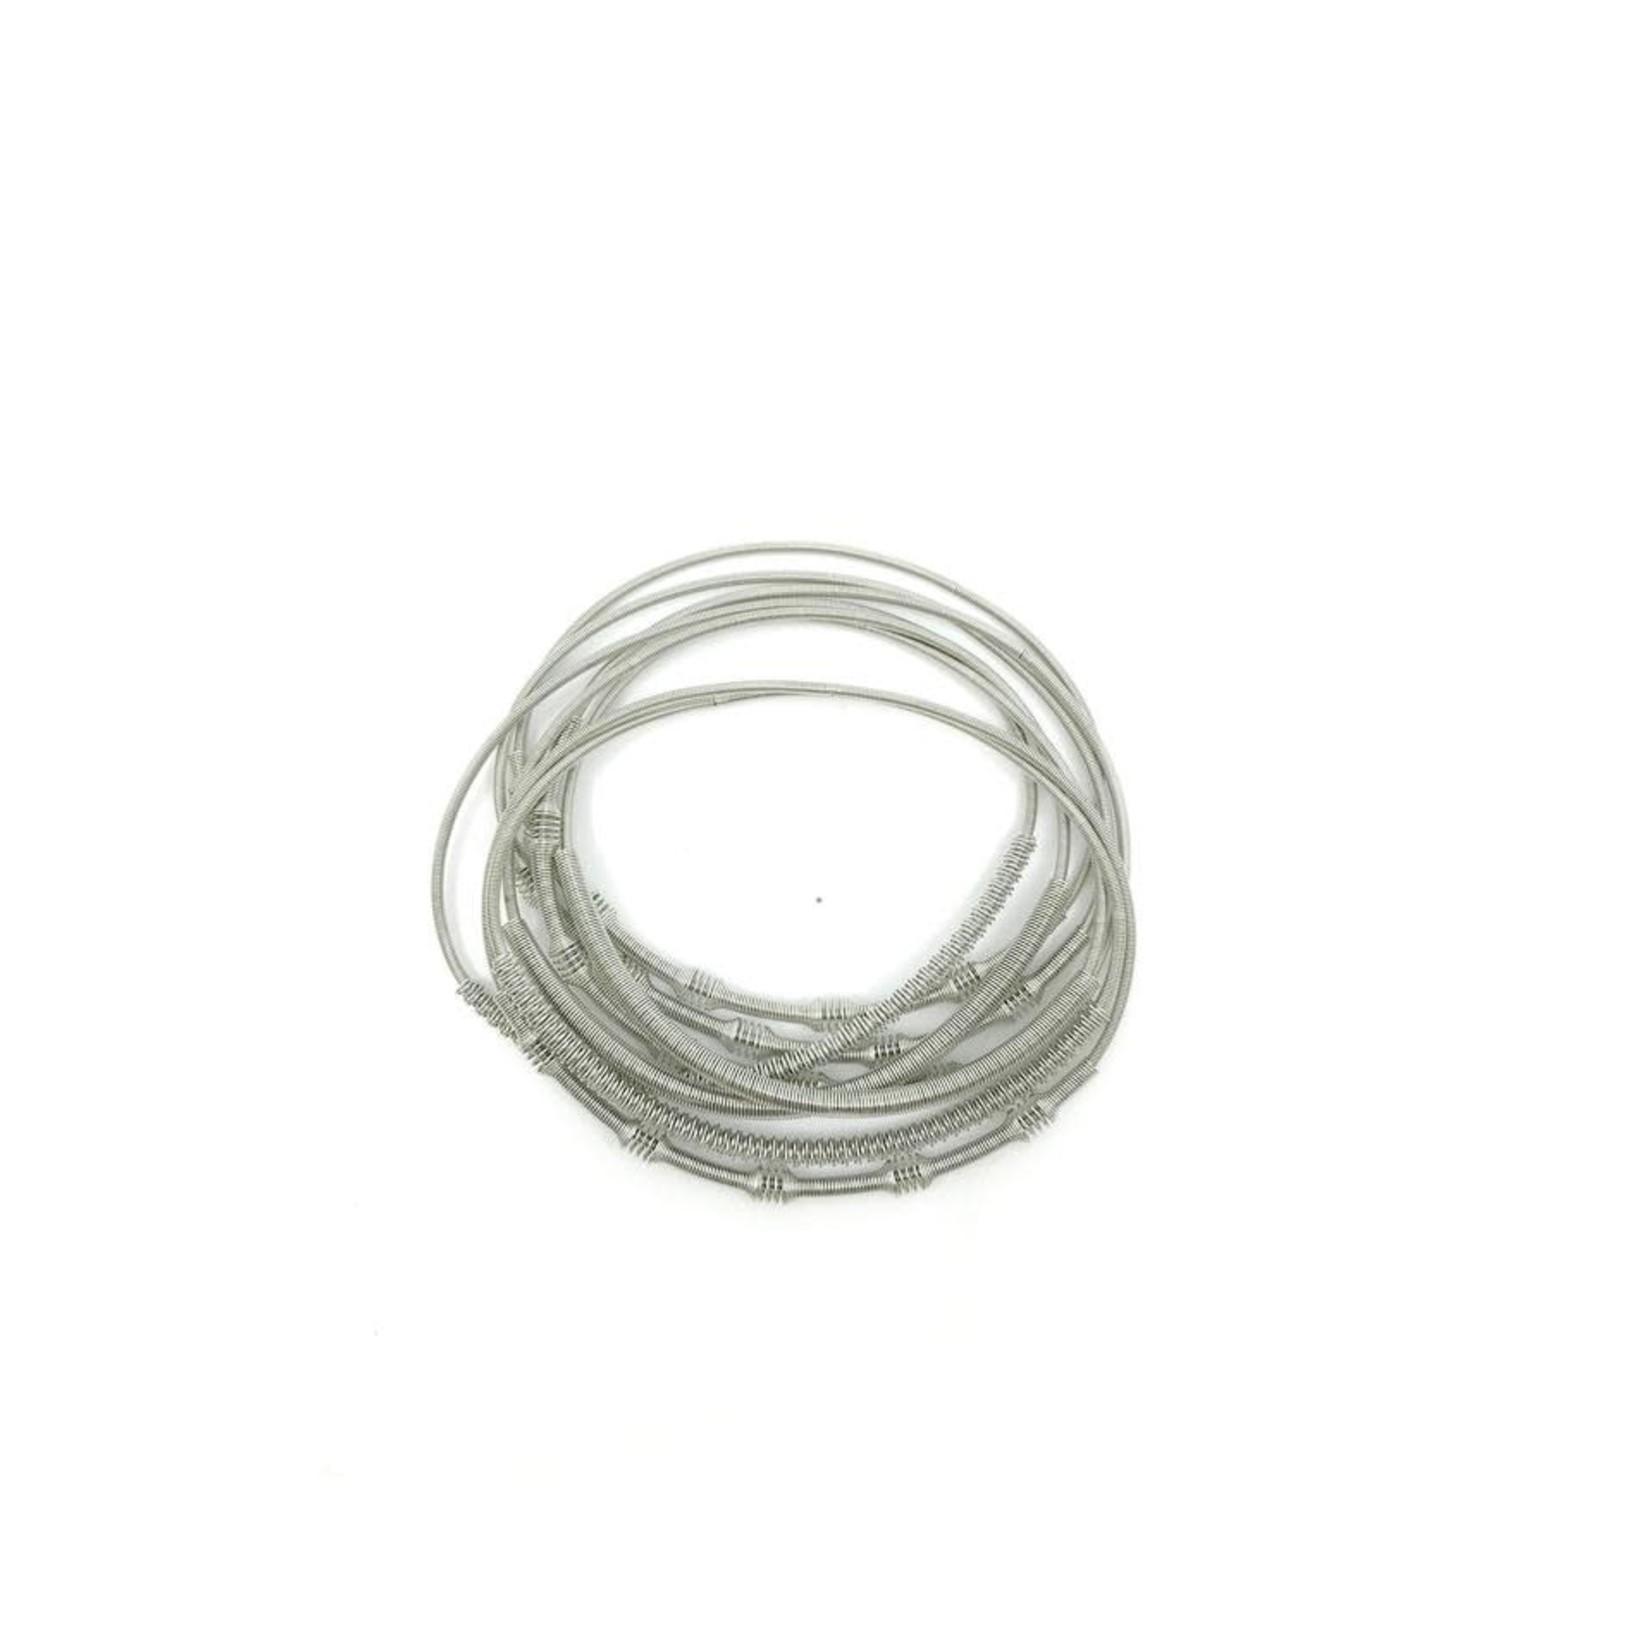 Sea Lily Silver Unbound Bracelet w/ Textured Sliding Sleeve